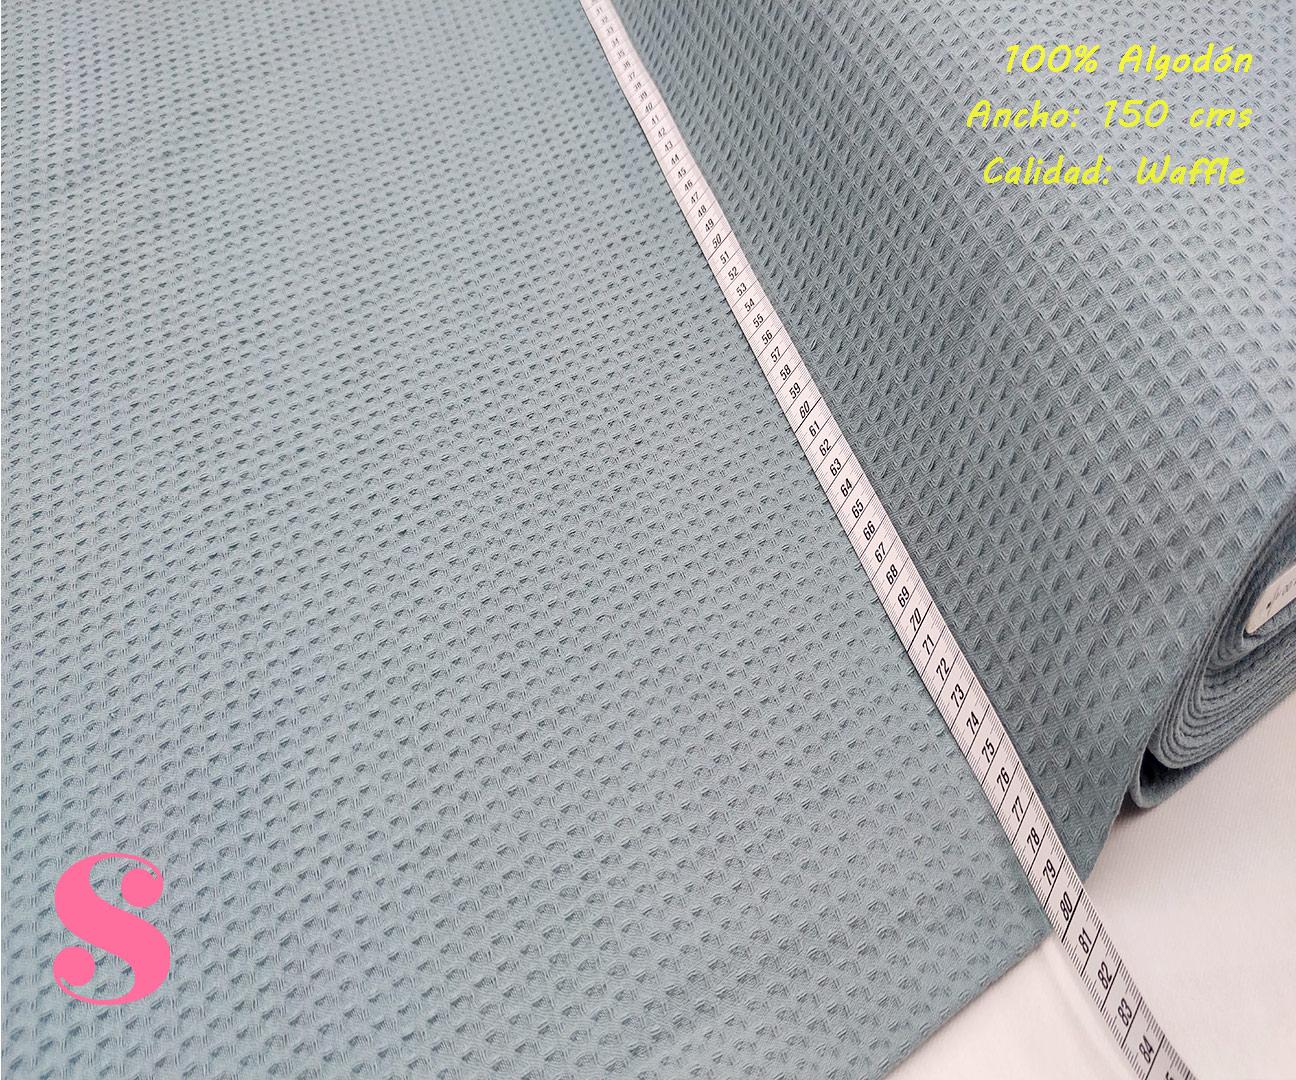 W8-waffle-tela-invierno-toalla-relieve-cuadros-gofre-algodon,Wafel Cuadrados Azul Agua